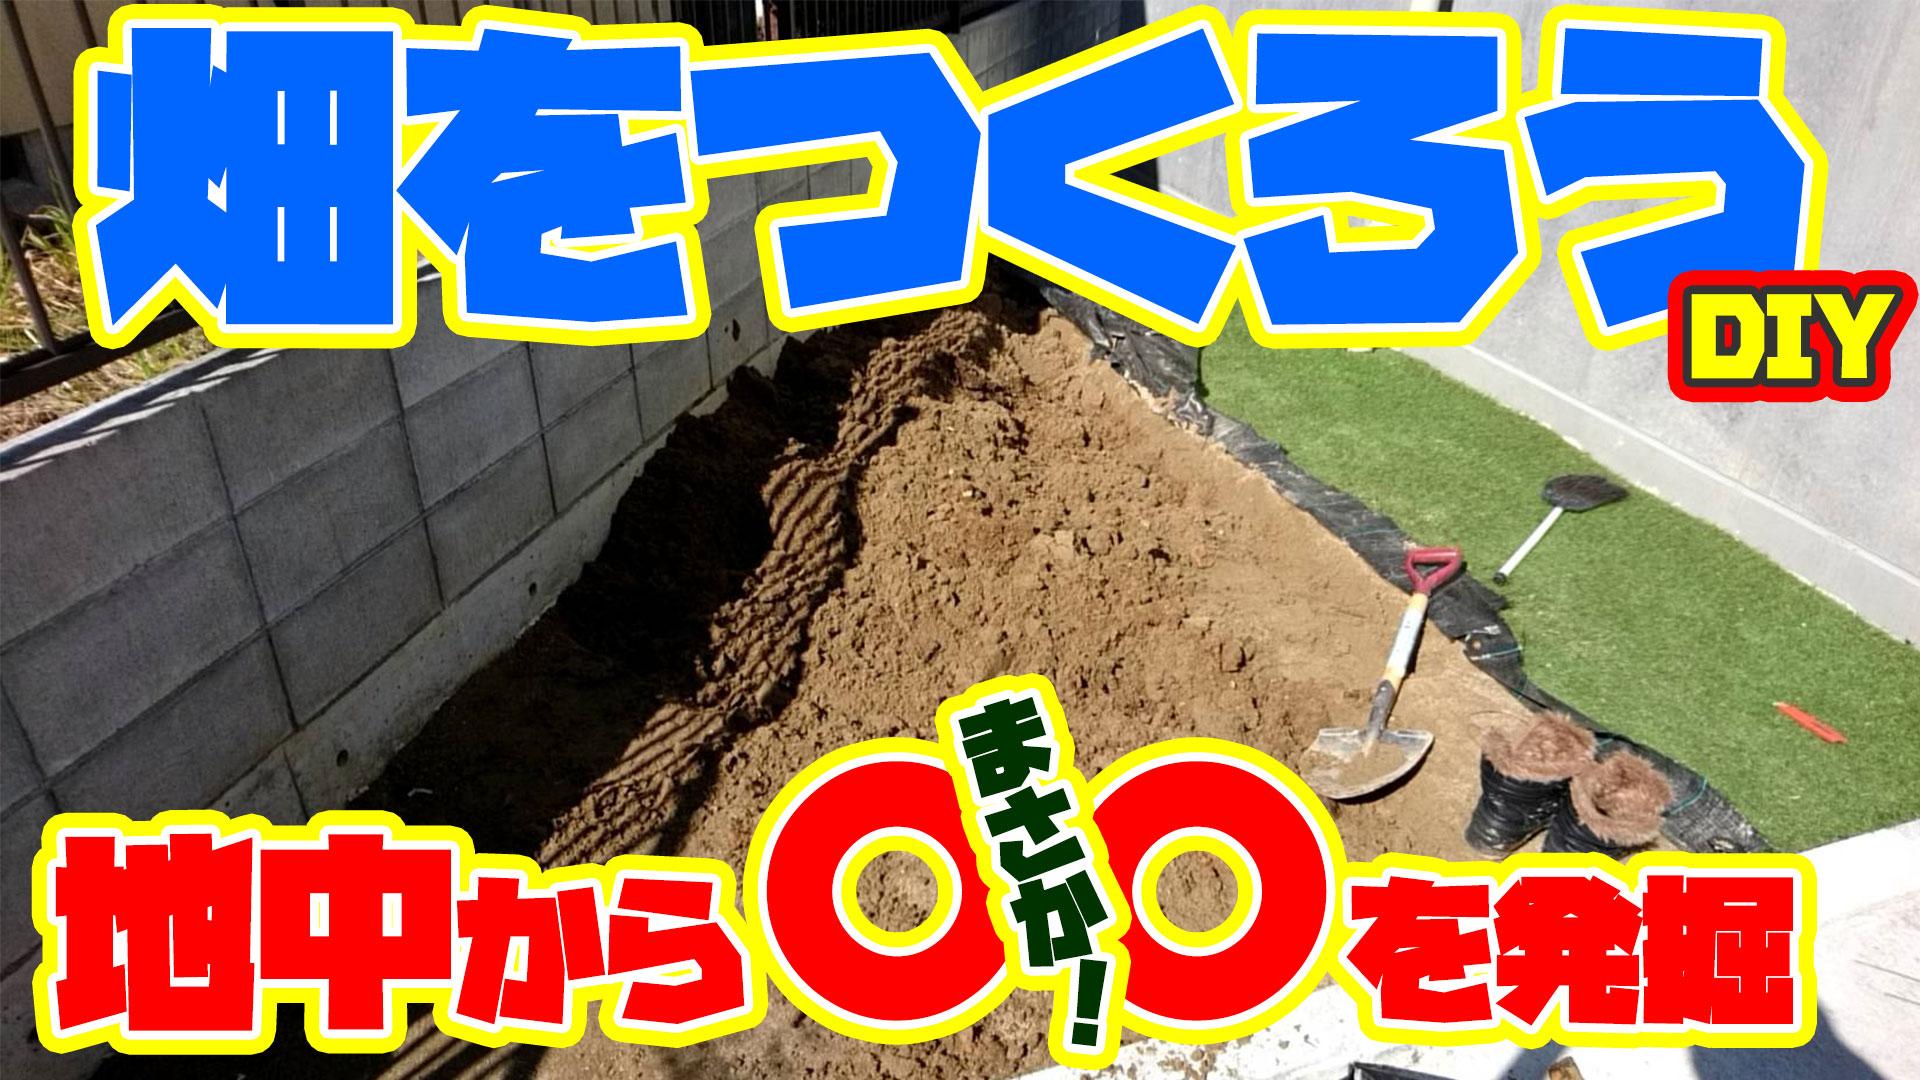 【DIY】家庭菜園をしよう!その前に人工芝を剥がして畑をつくろう!土を掘っていると大きな○○が!!【驚愕】